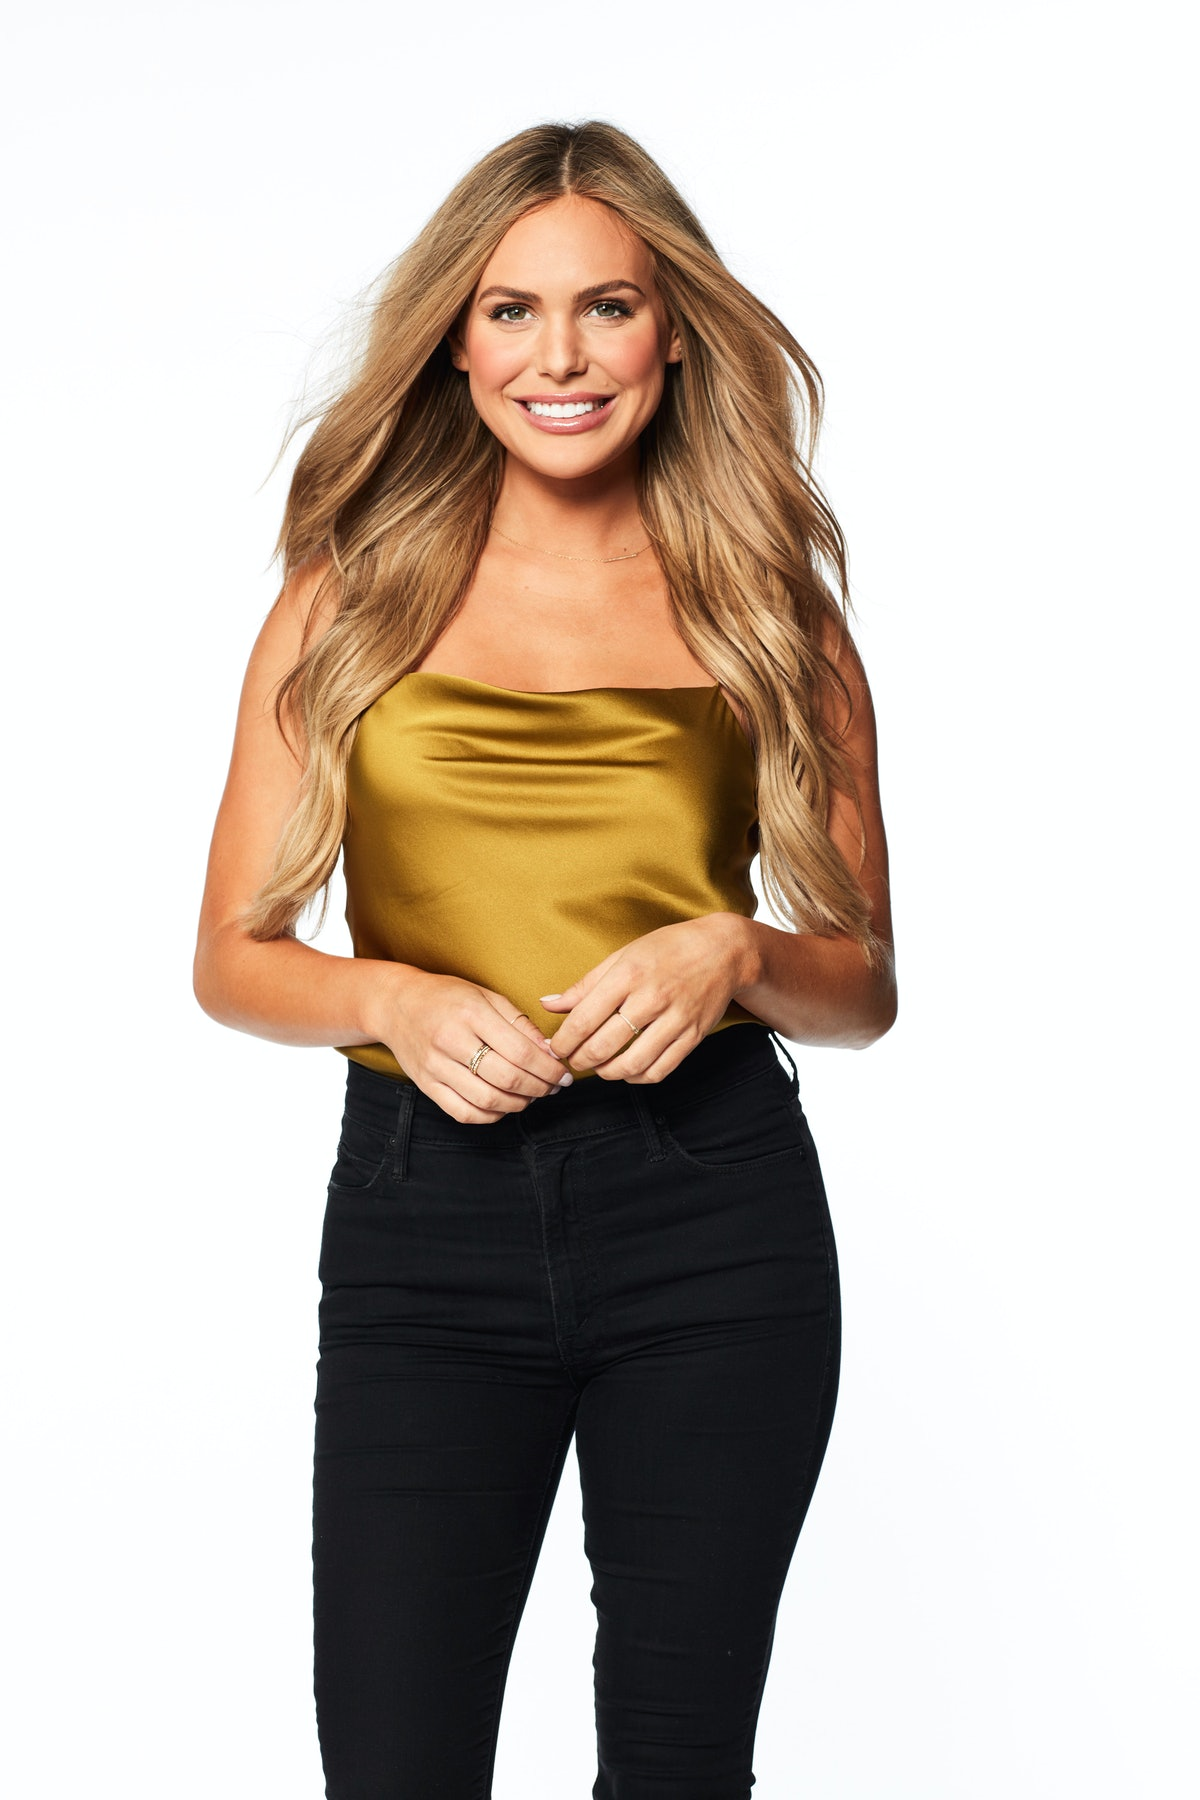 Kylie on 'The Bachelor'